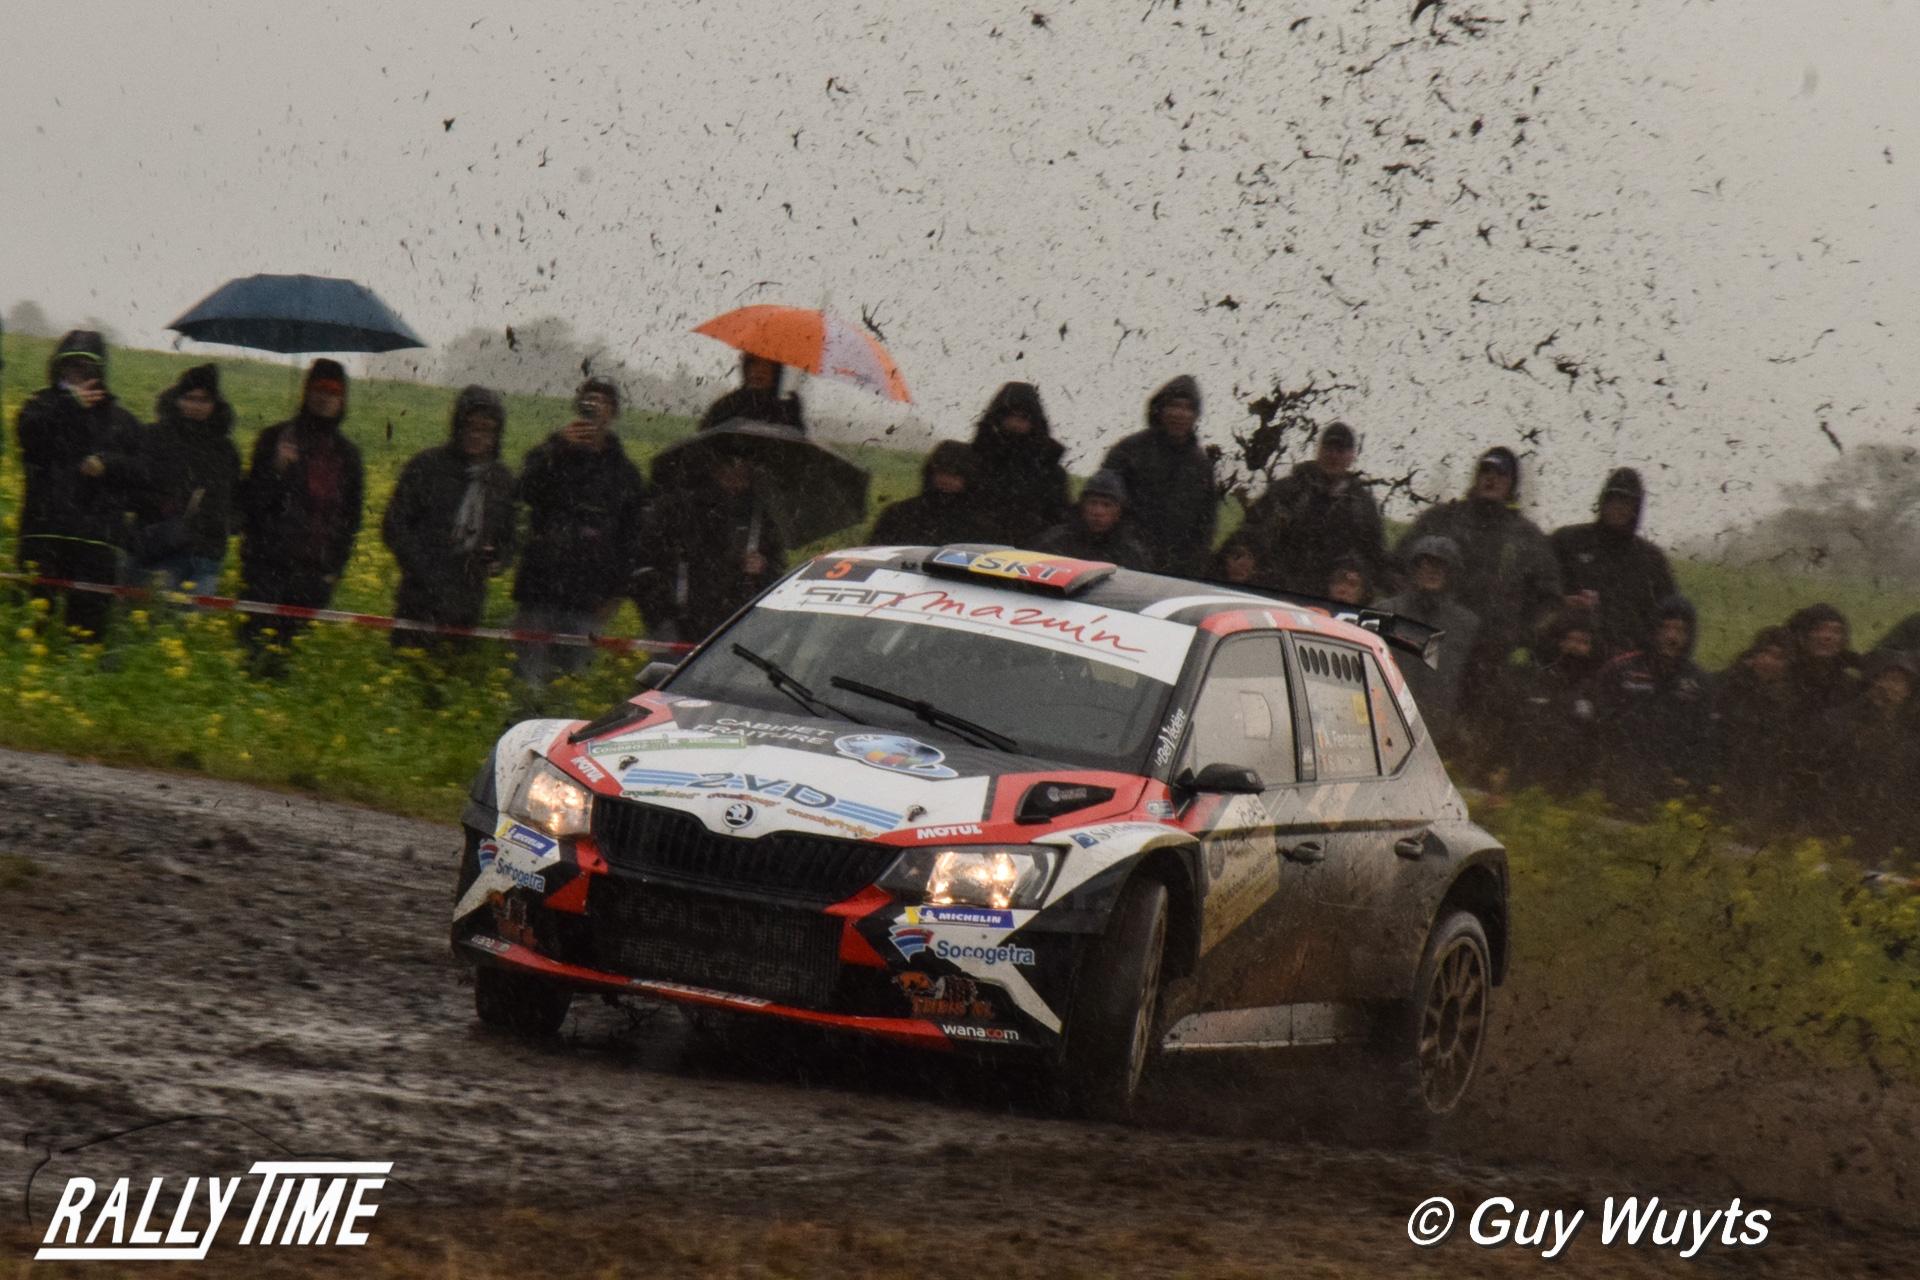 Stéphane Lefebvre wint Condroz Rally, Adrian Fernémont kampioen